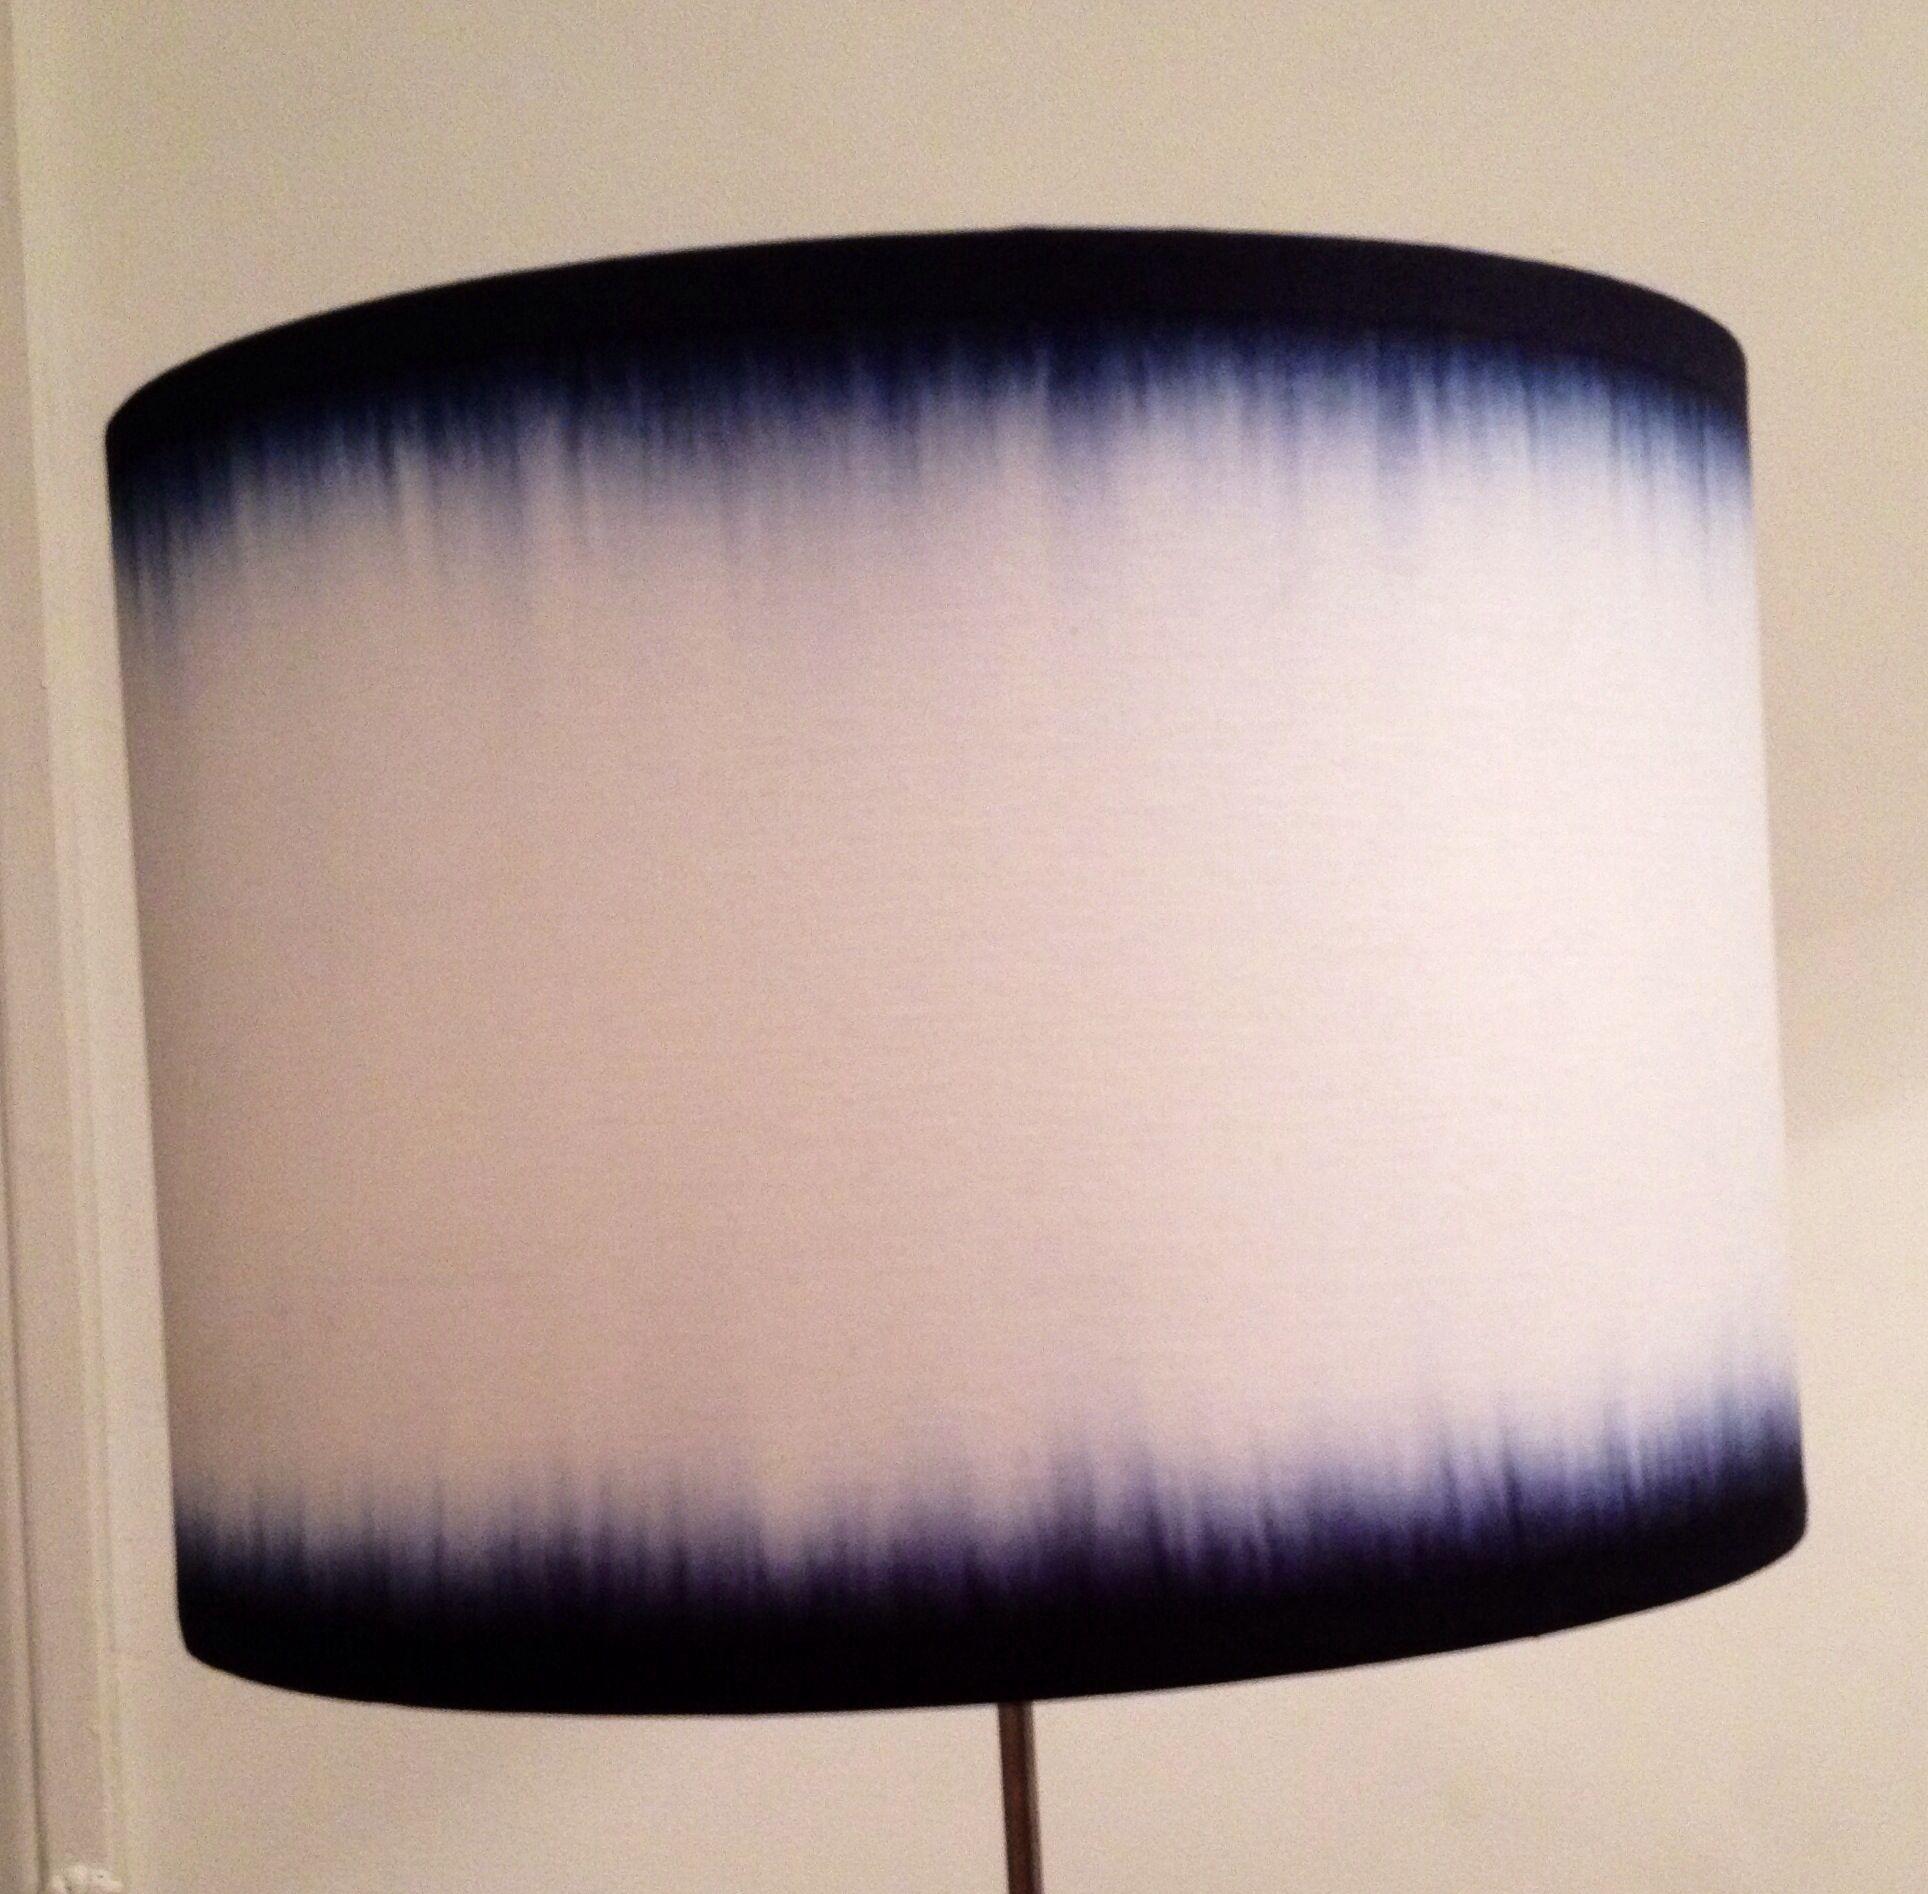 Double Denim - DYLON Jeans Blue dye on a plain white lampshade ...